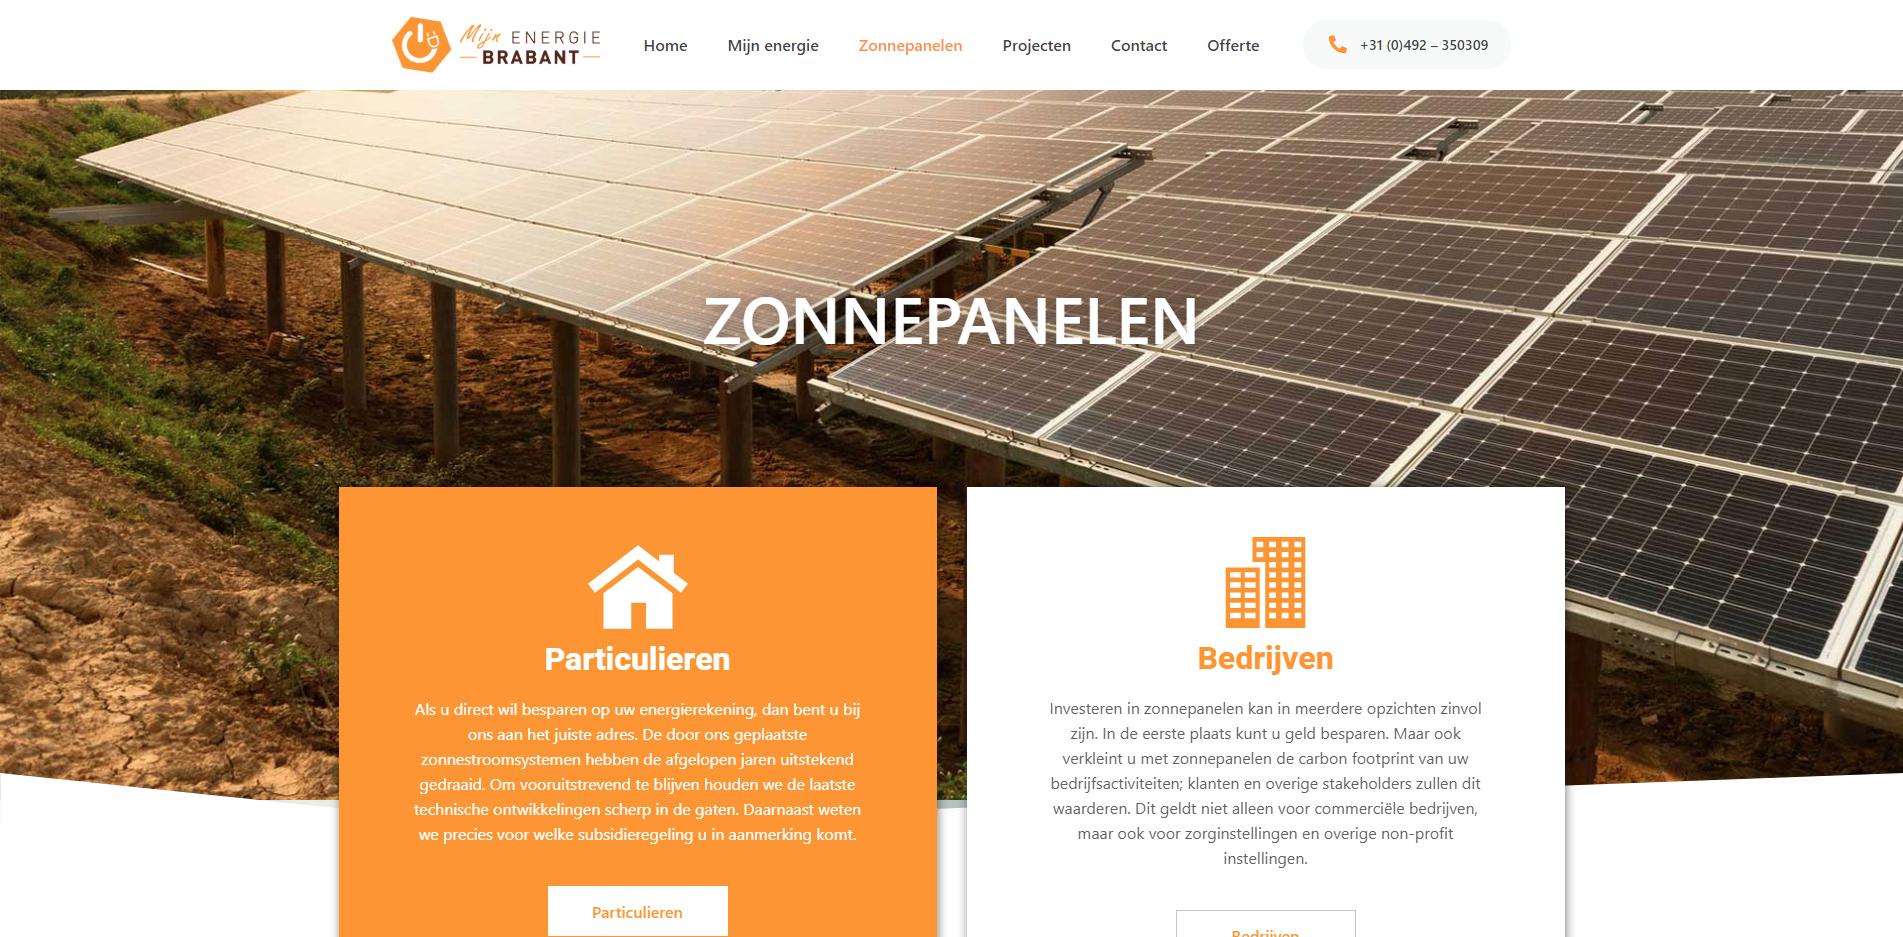 mijnenergiebrabant-zonnepanelen